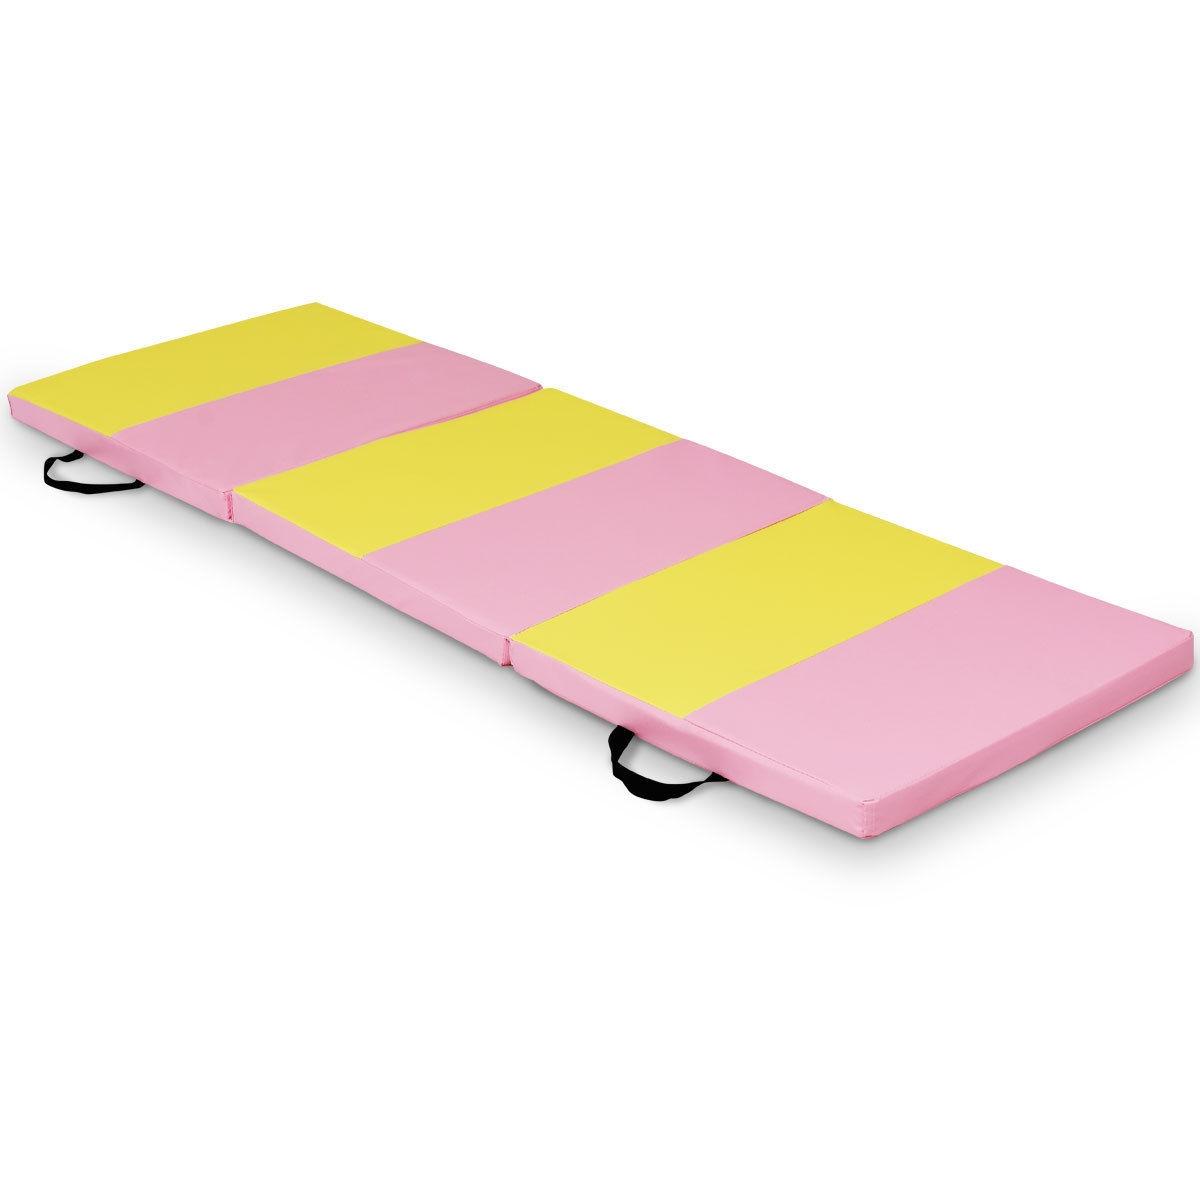 6' x 2' Folding Fitness Exercise Carry Gymnastics Mat